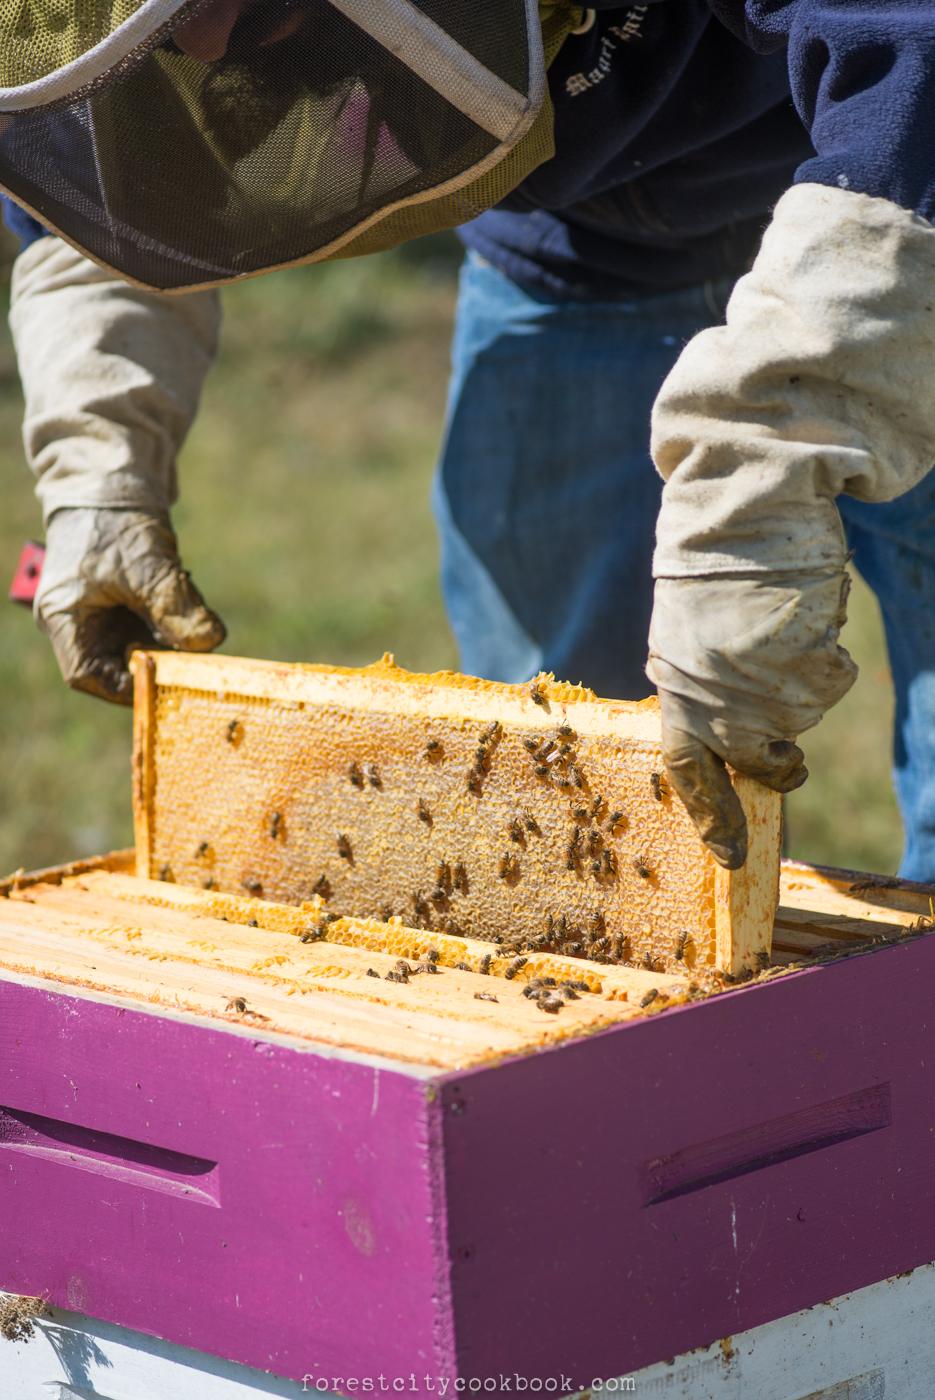 Forest City Cookbook - Wildflowers Honey